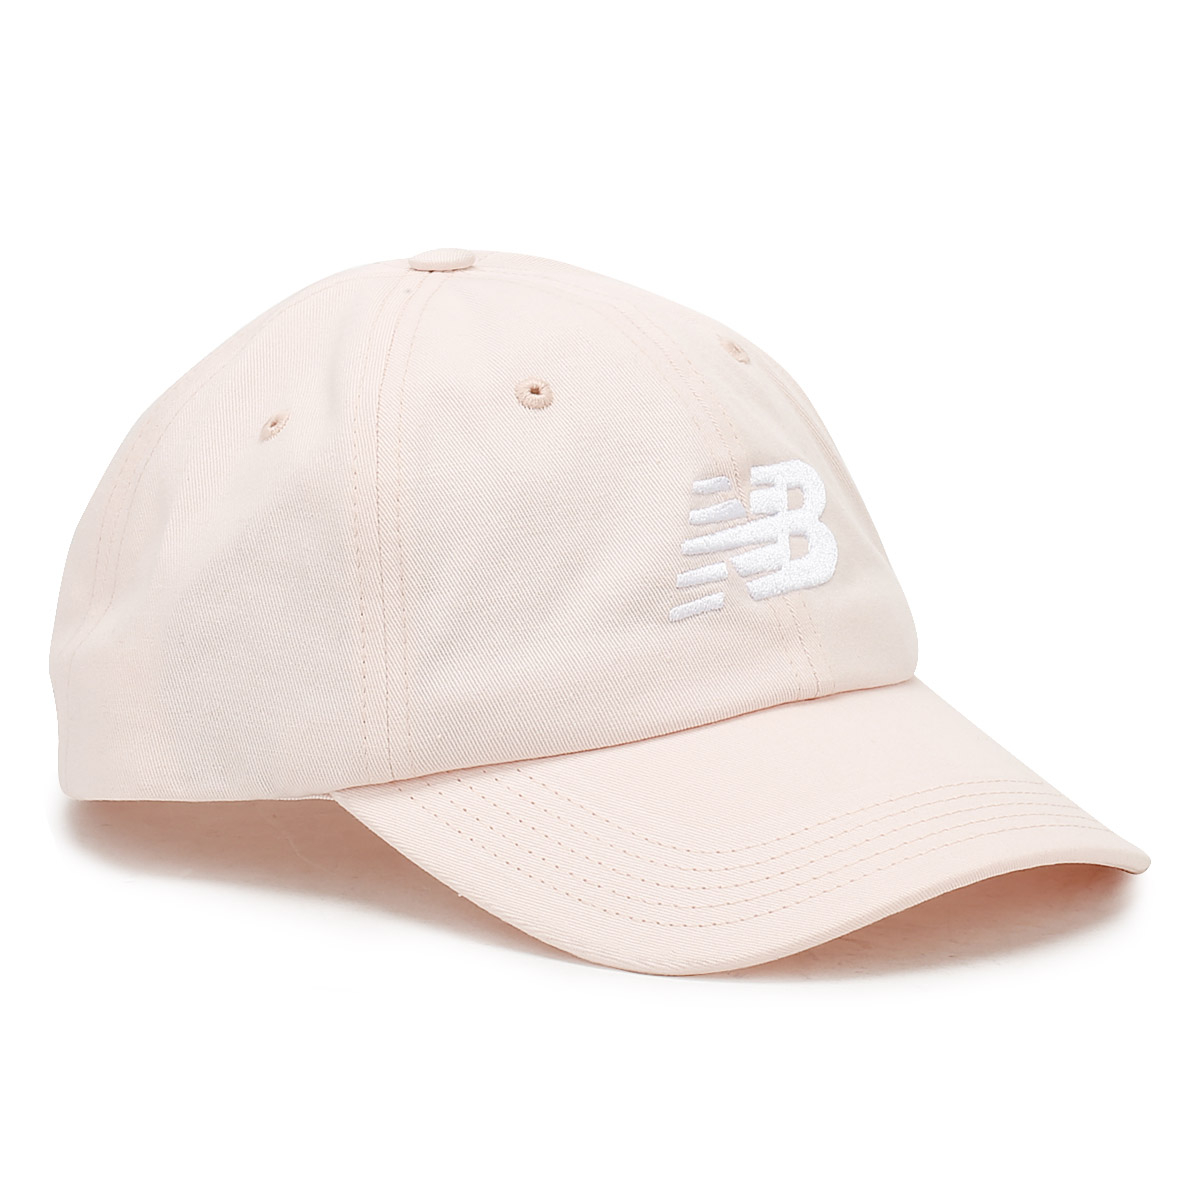 3bd66fd4076 New Balance Pink Sandstone 6 Panel Cap Unisex Baseball Casual Hat ...